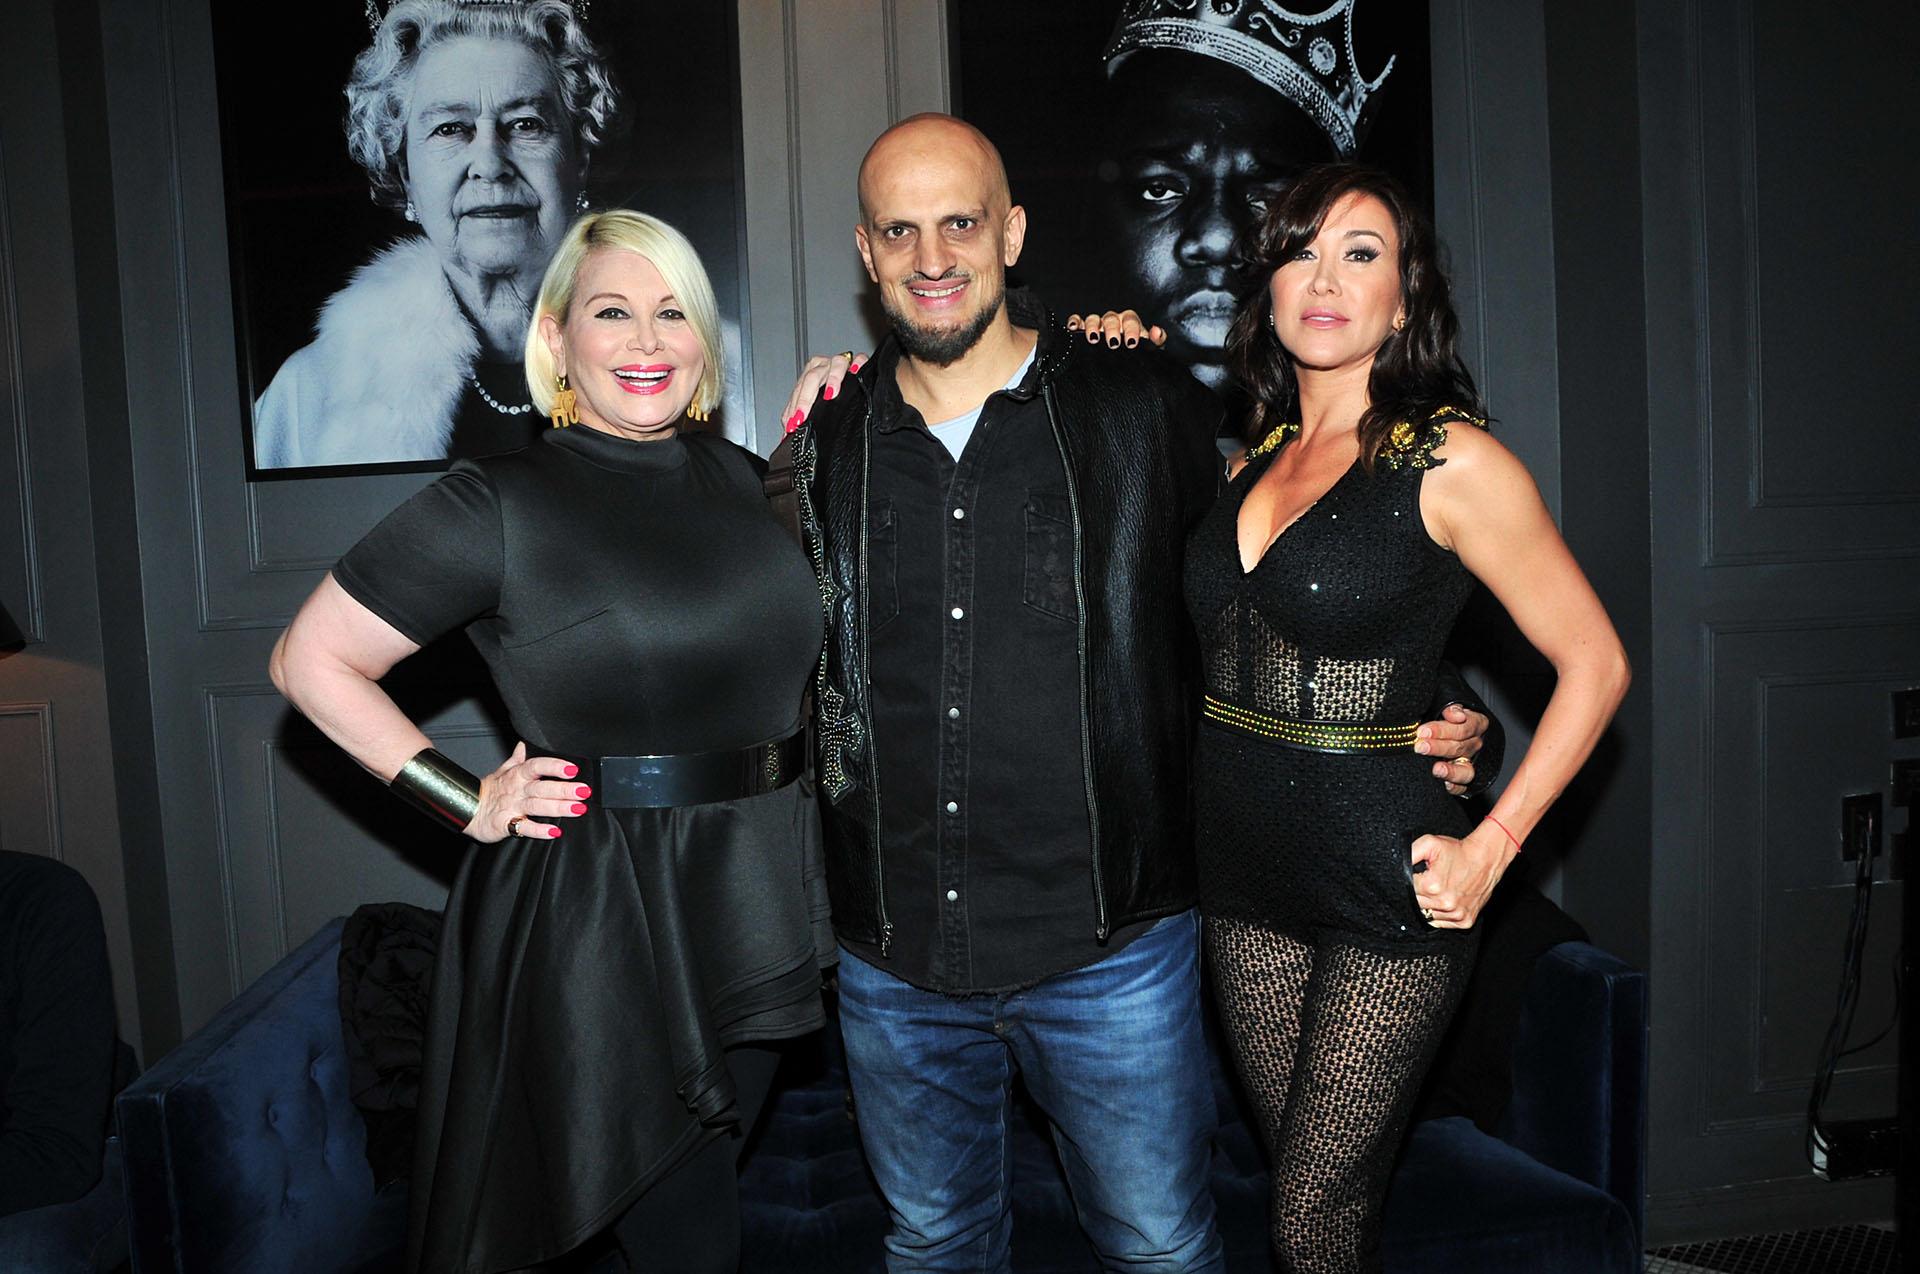 Carmen Barbieri, Guillermo Marín y Valeria Archimó (Verónica Guerman/Teleshow)